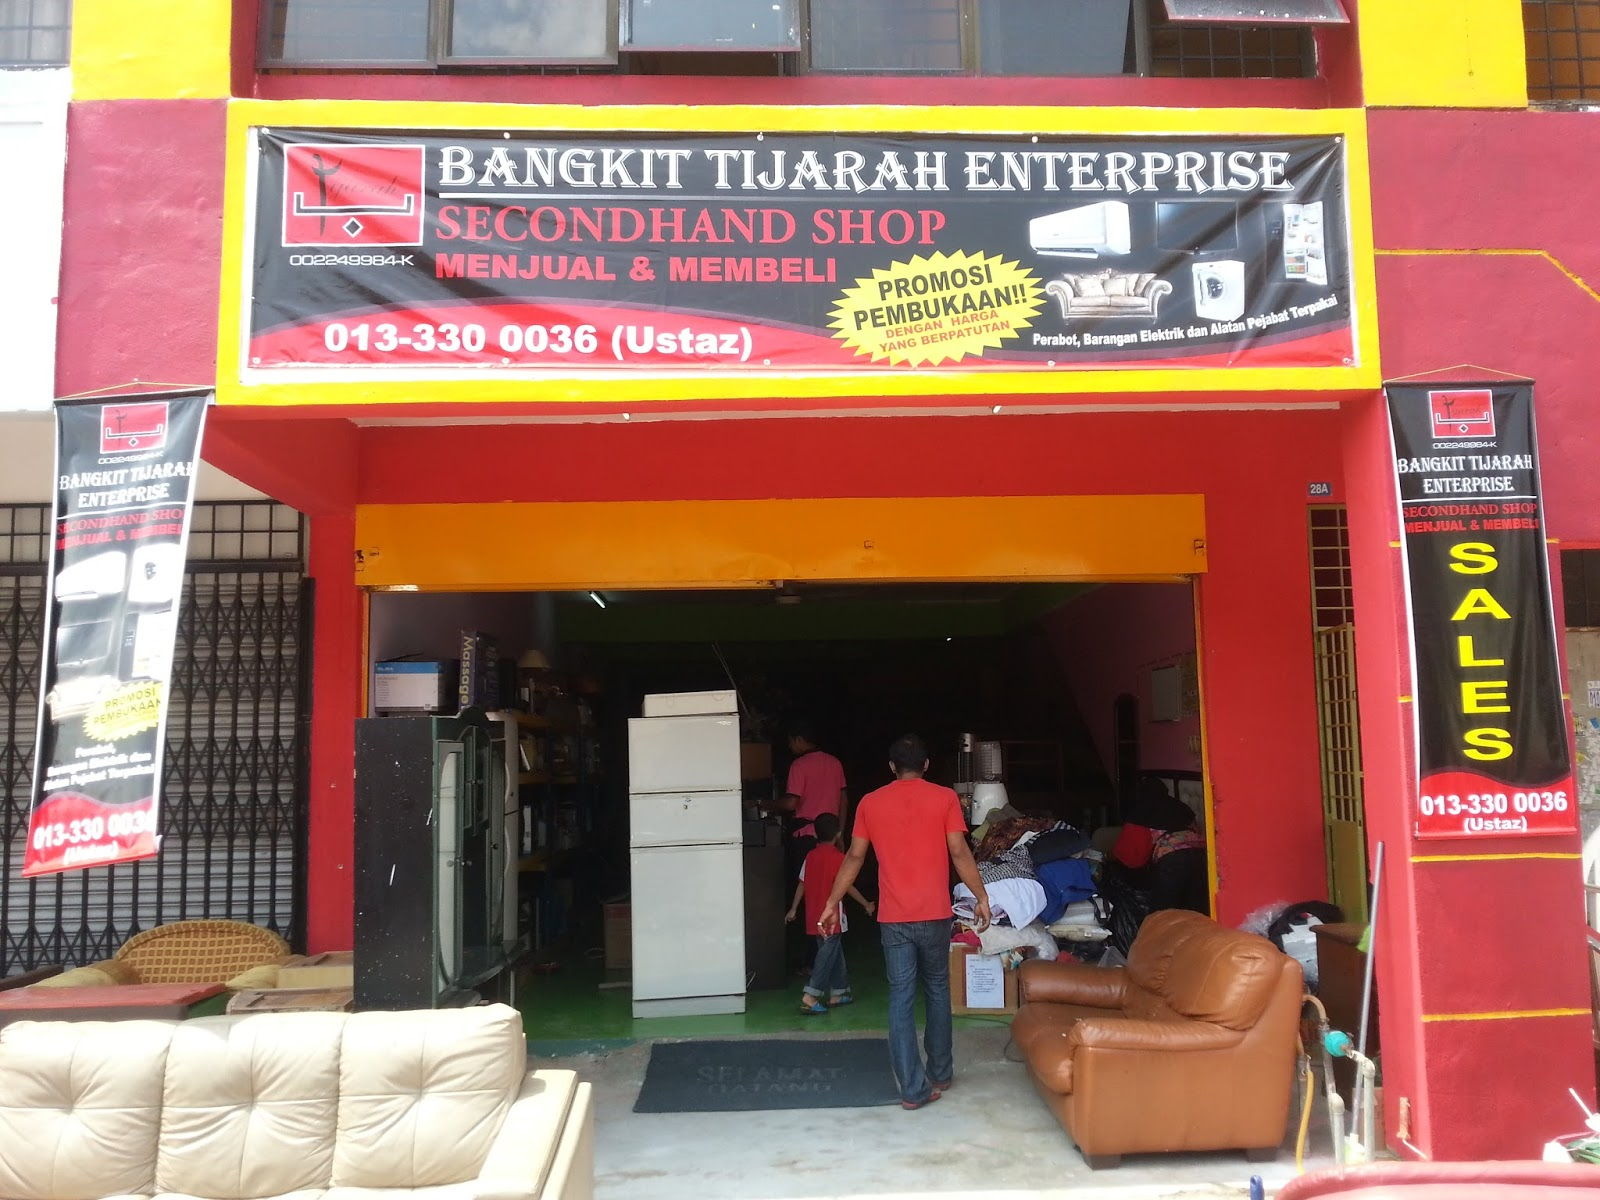 Secondhand Shop No 28 28a Jalan 1 8 Bandar Teknologi Kajang 43000 Kajang Selangor Tel 013 3300036